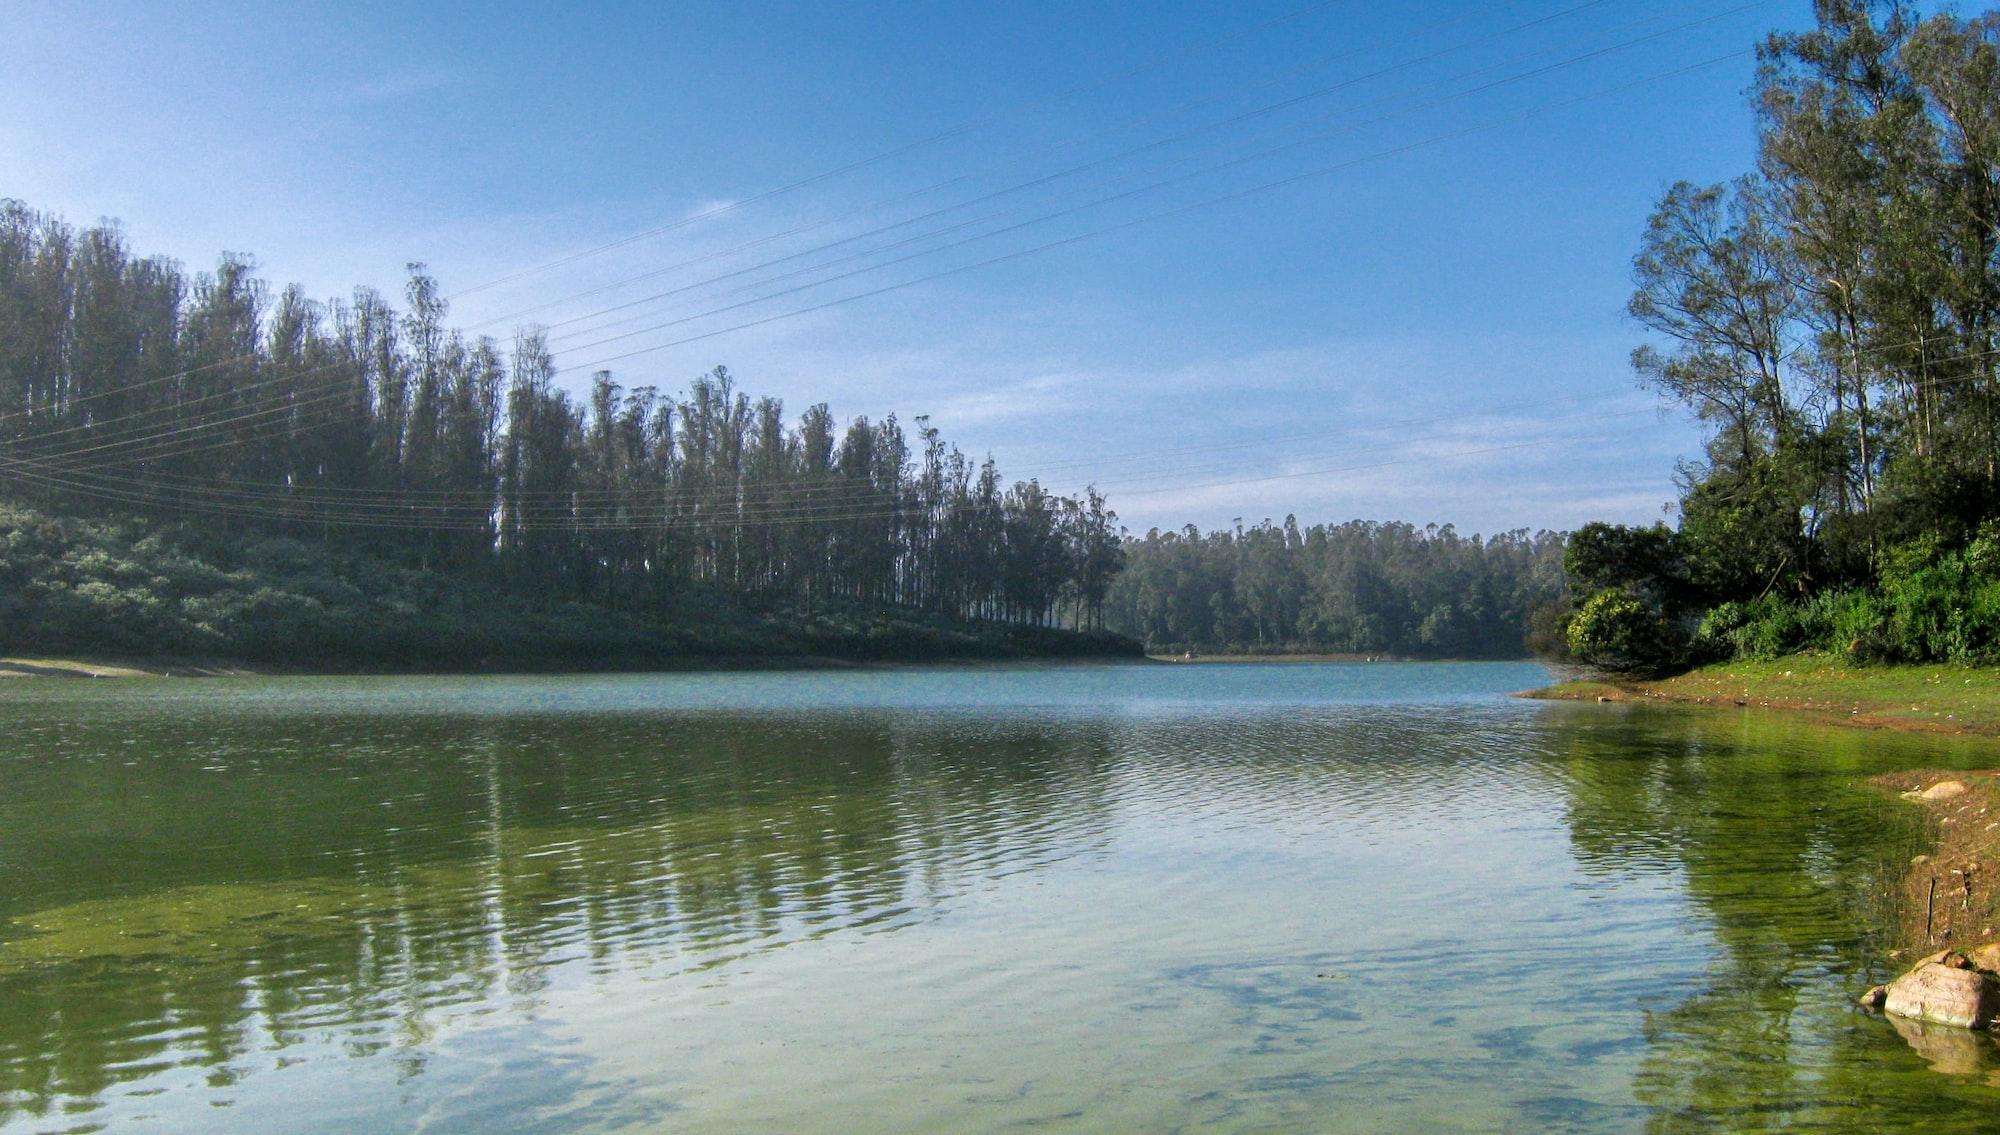 Serene land near the pine forest.